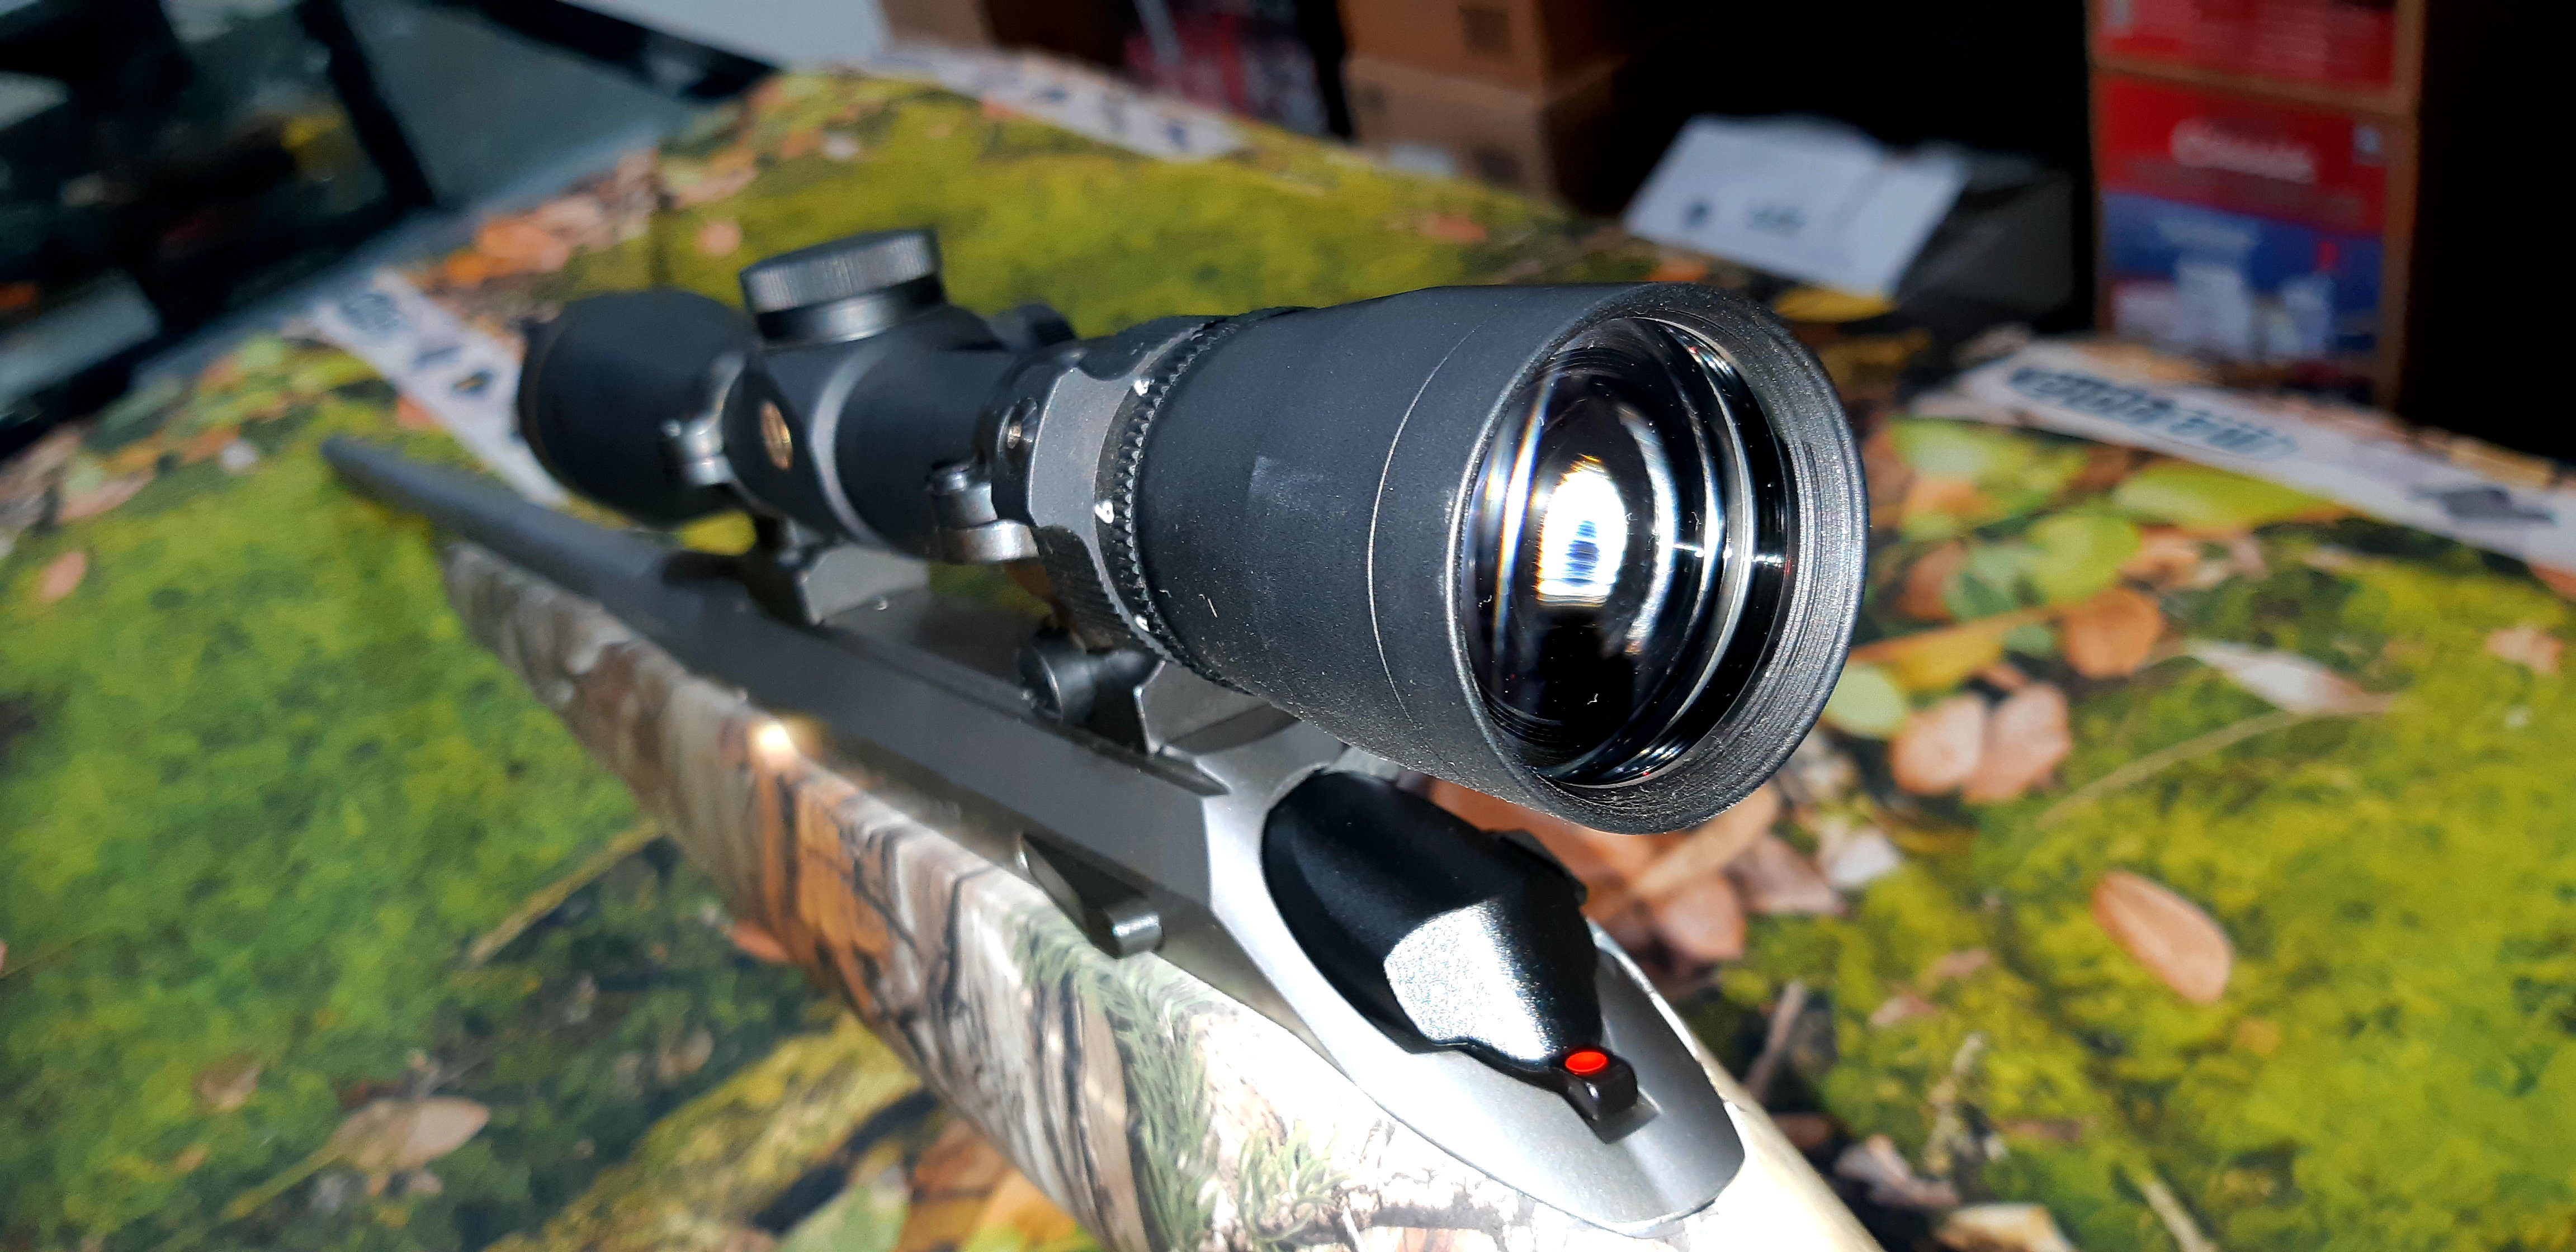 Tikka T3x Camo Stainless  223 + Scope | sunburyfirearms